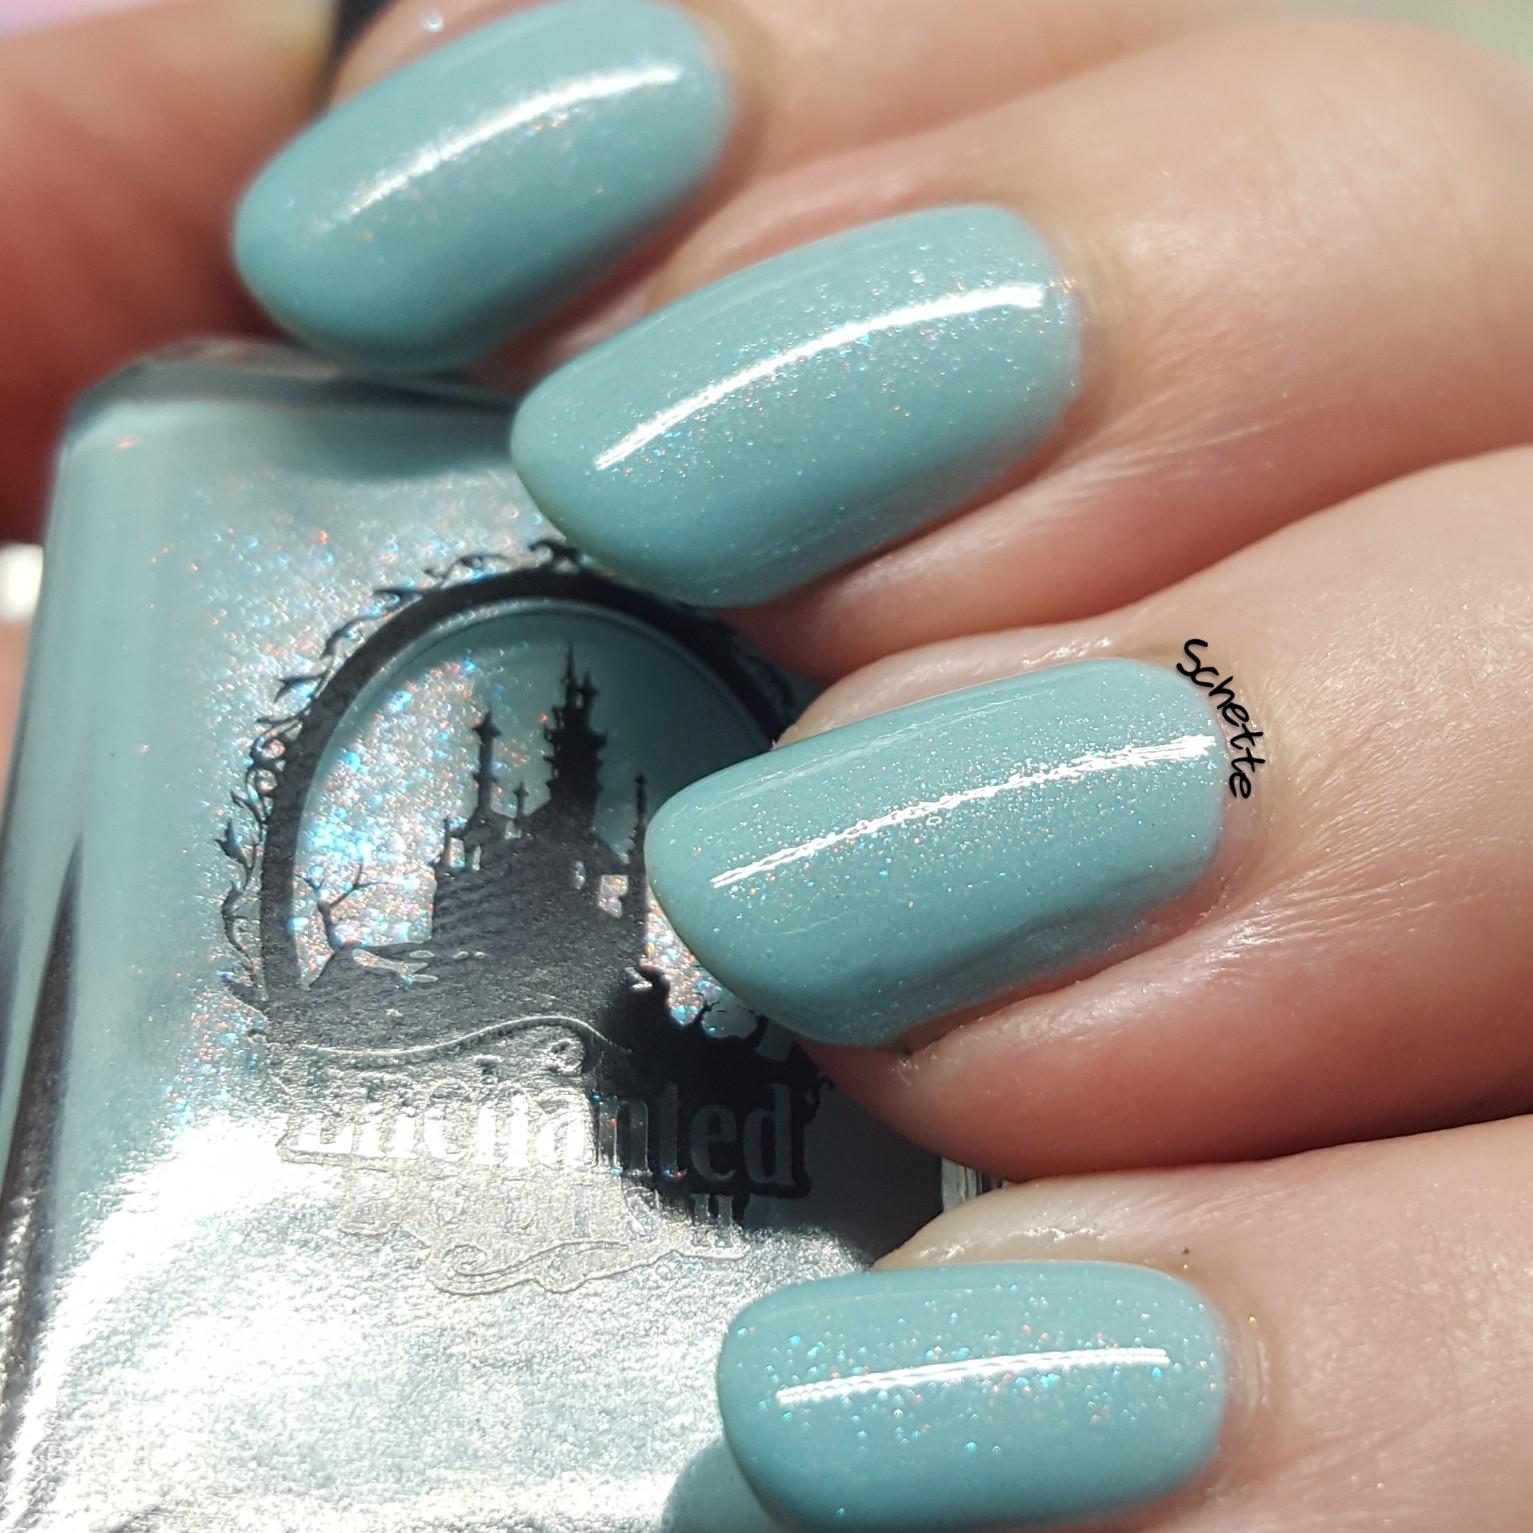 Enchanted Polish - Fly